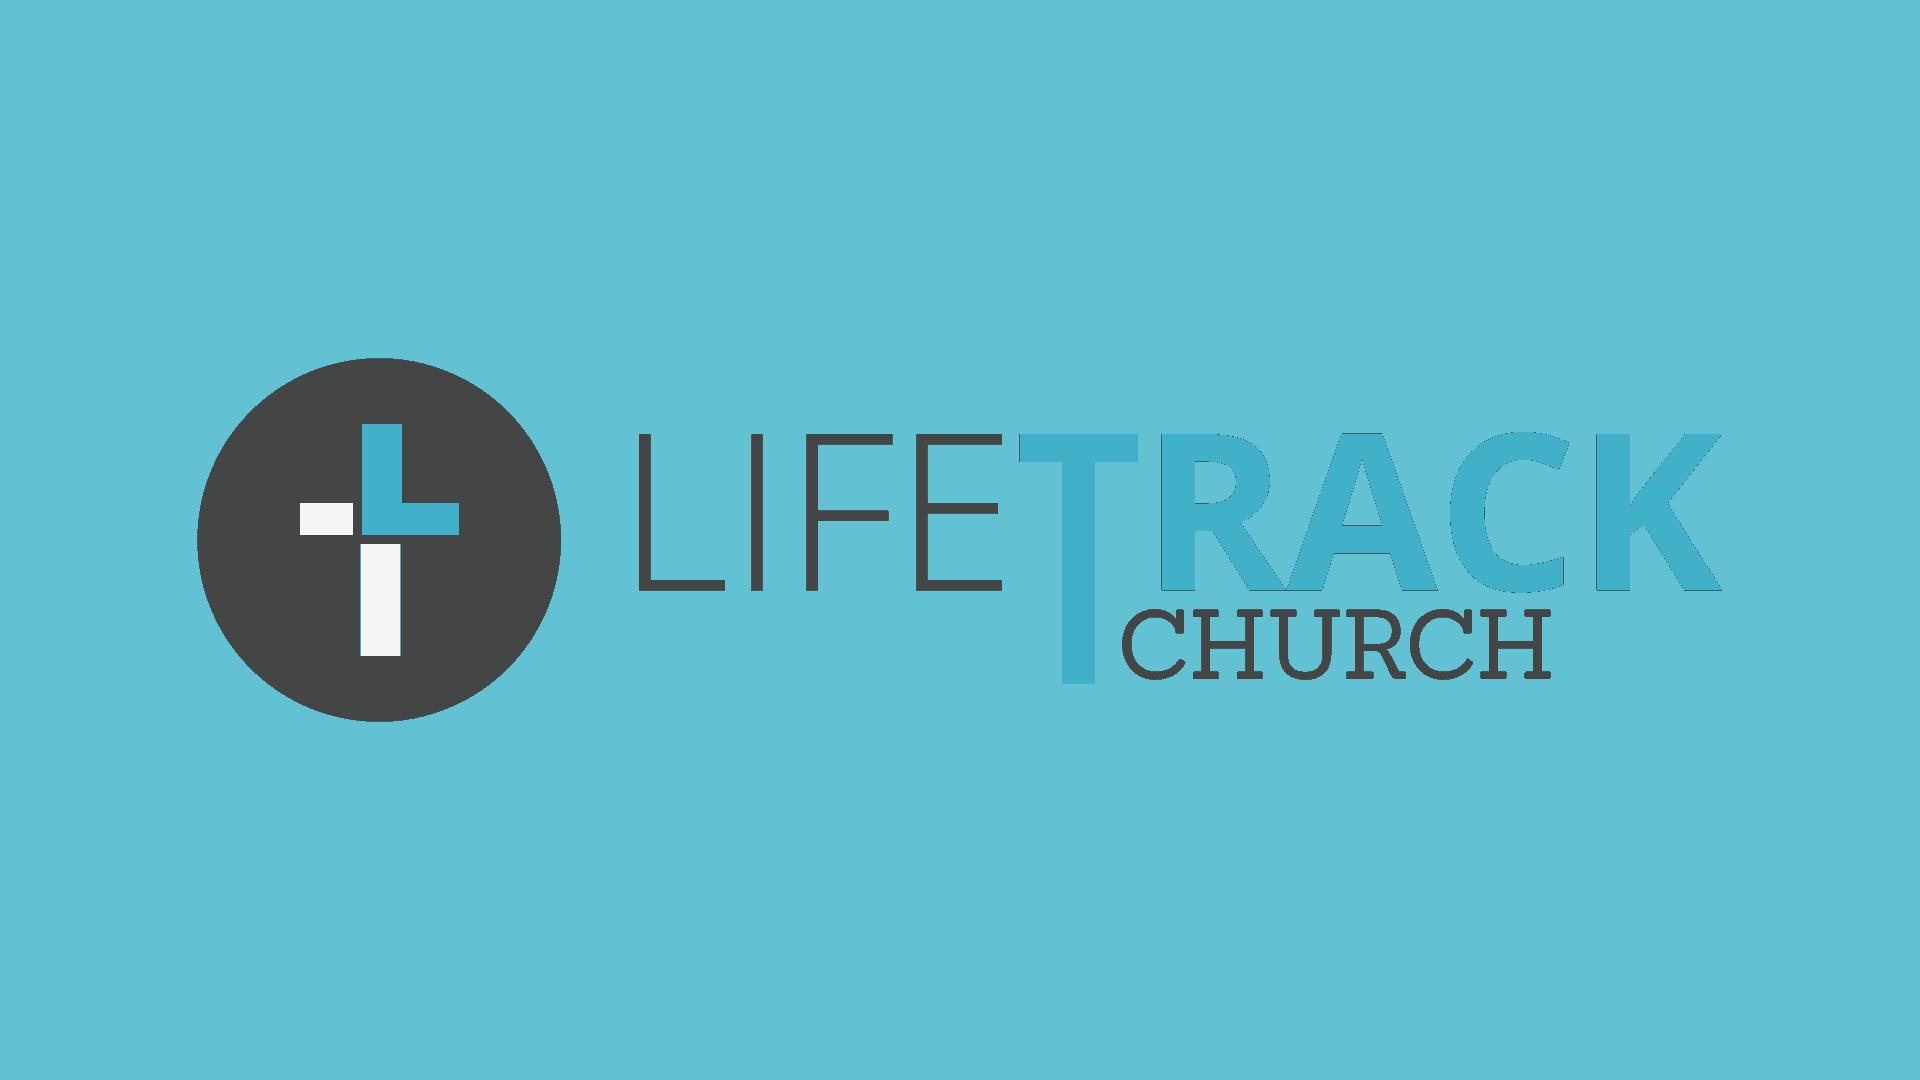 Lifetrack Church